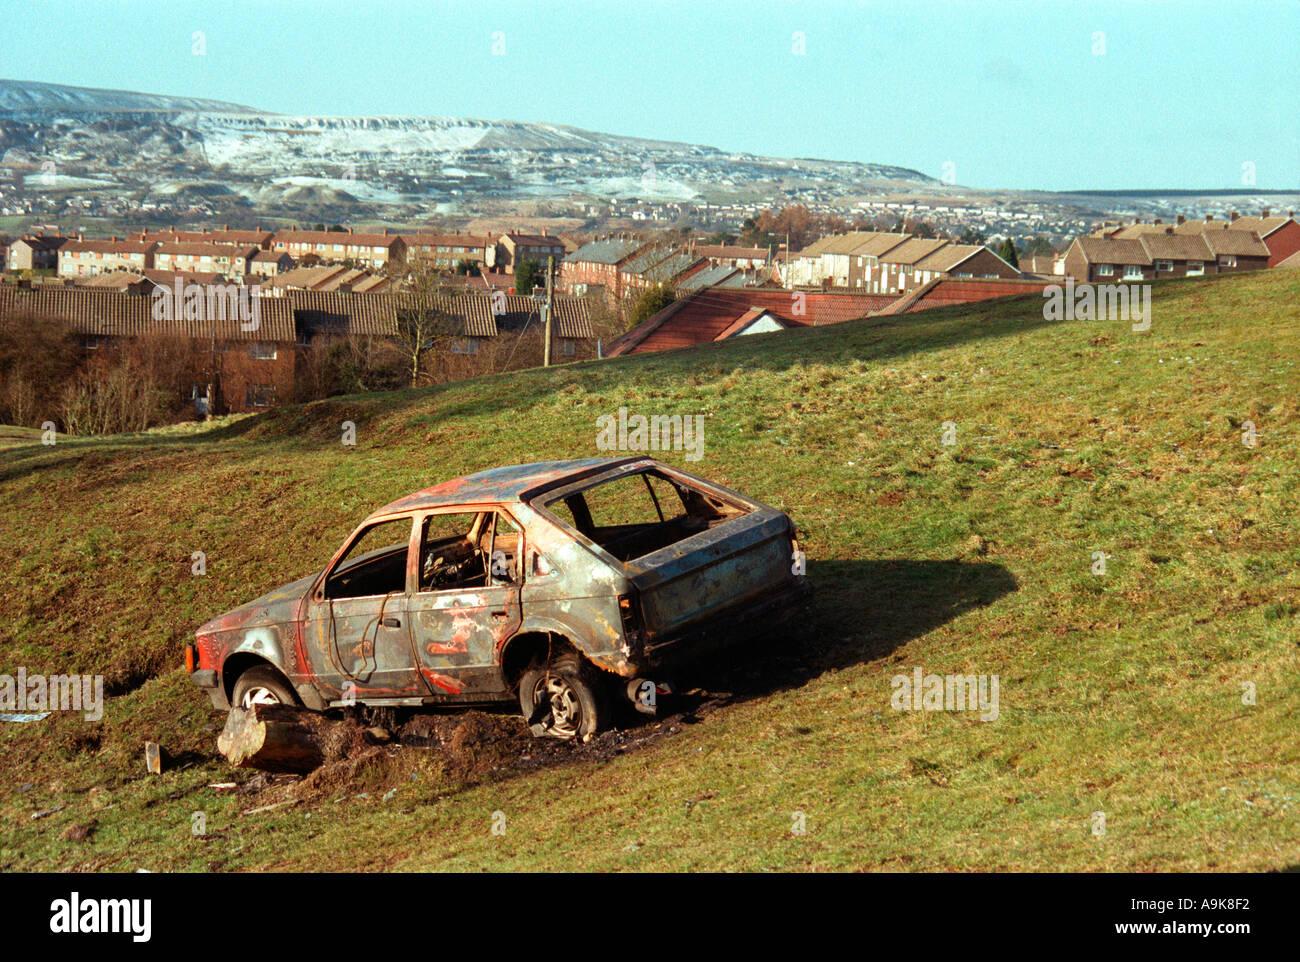 Buy Abandoned Cars